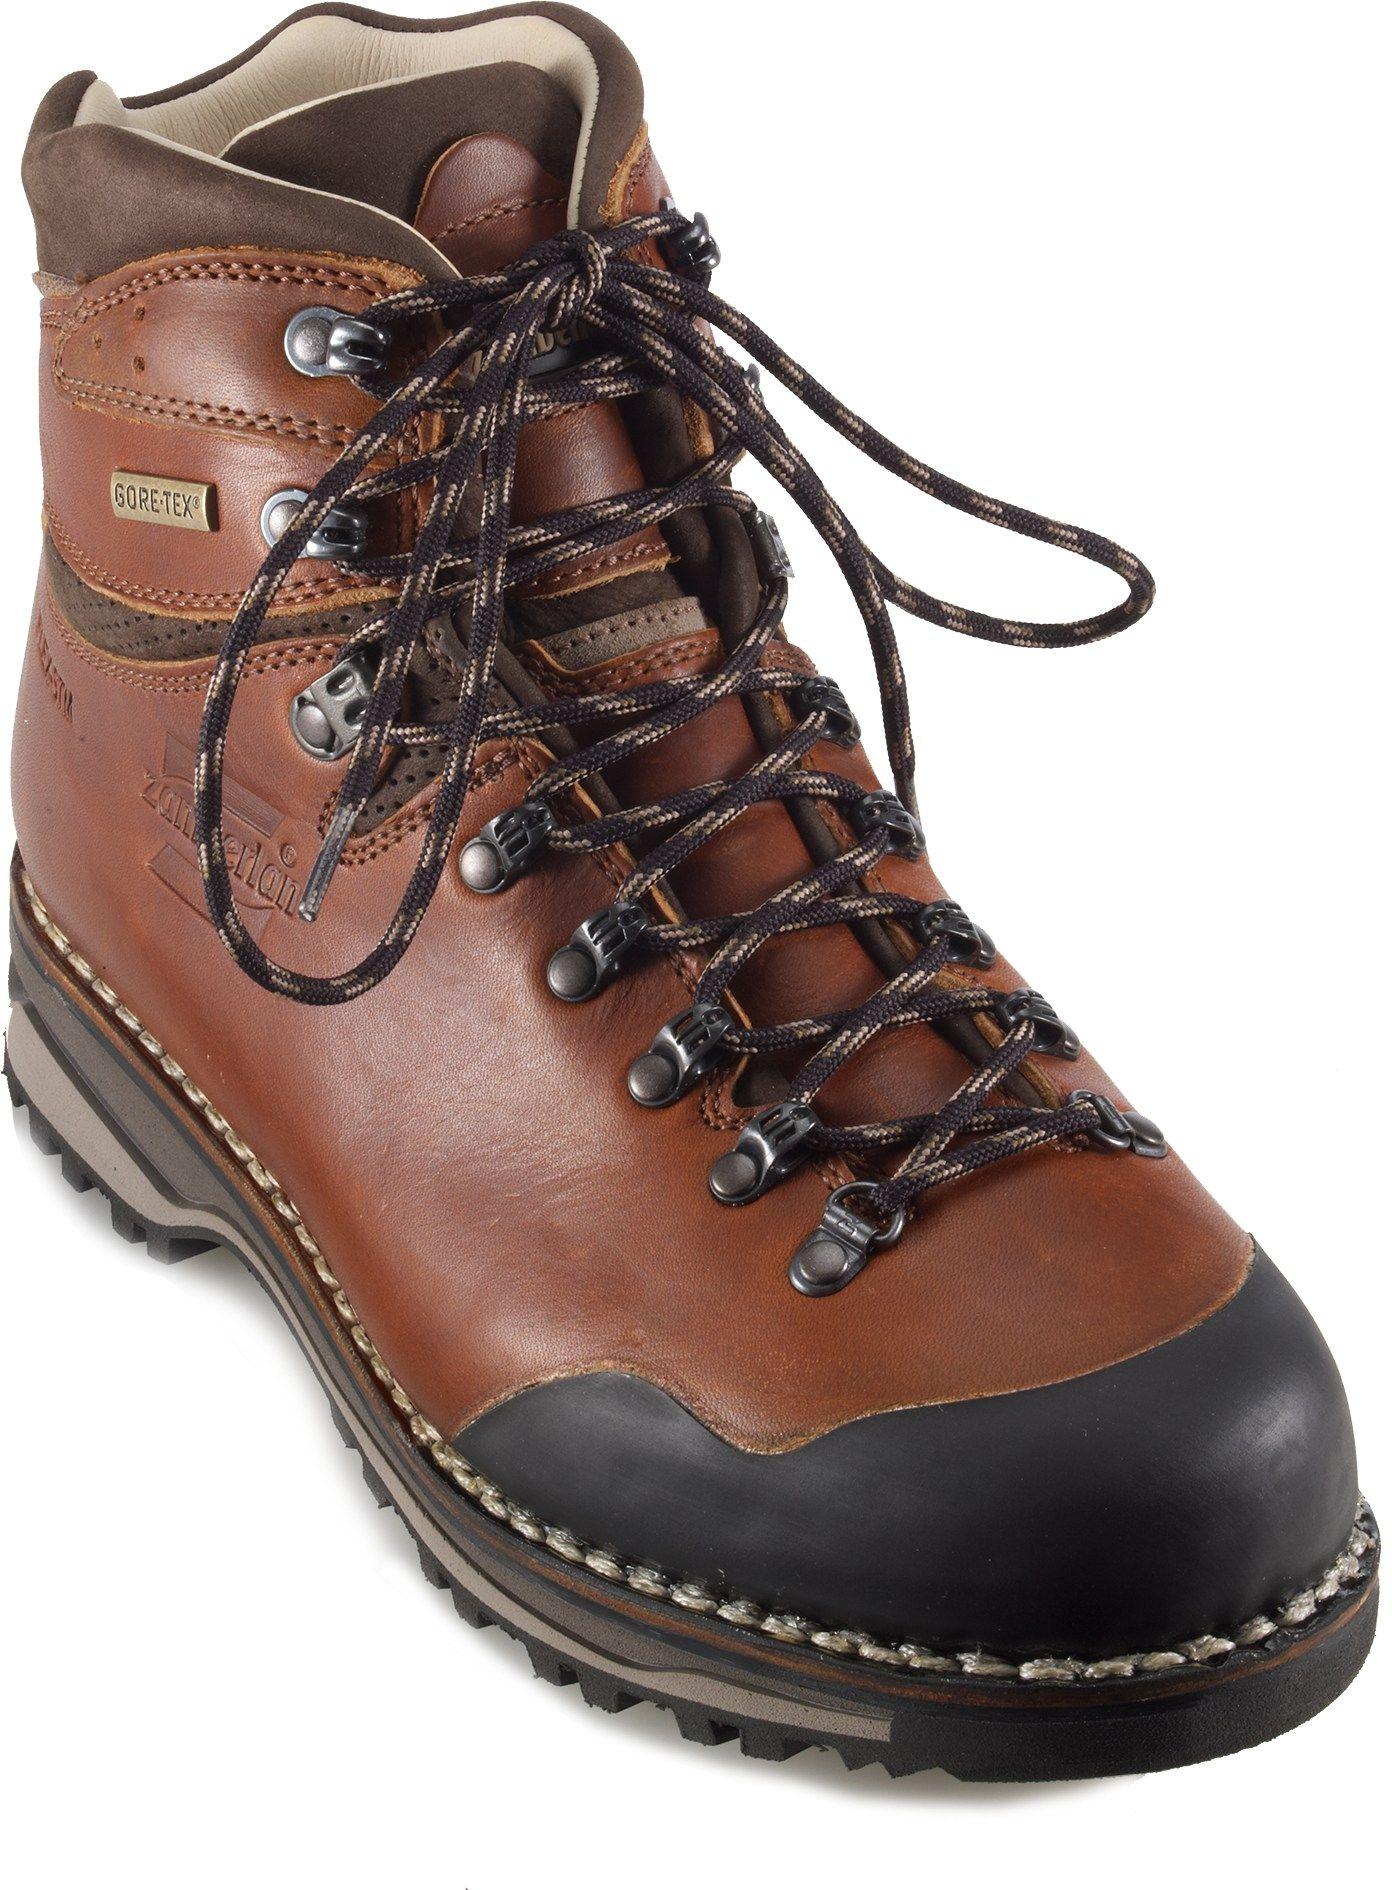 Zamberlan 1025 Tofane NW GT RR Hiking Boots - Men's - Free ...